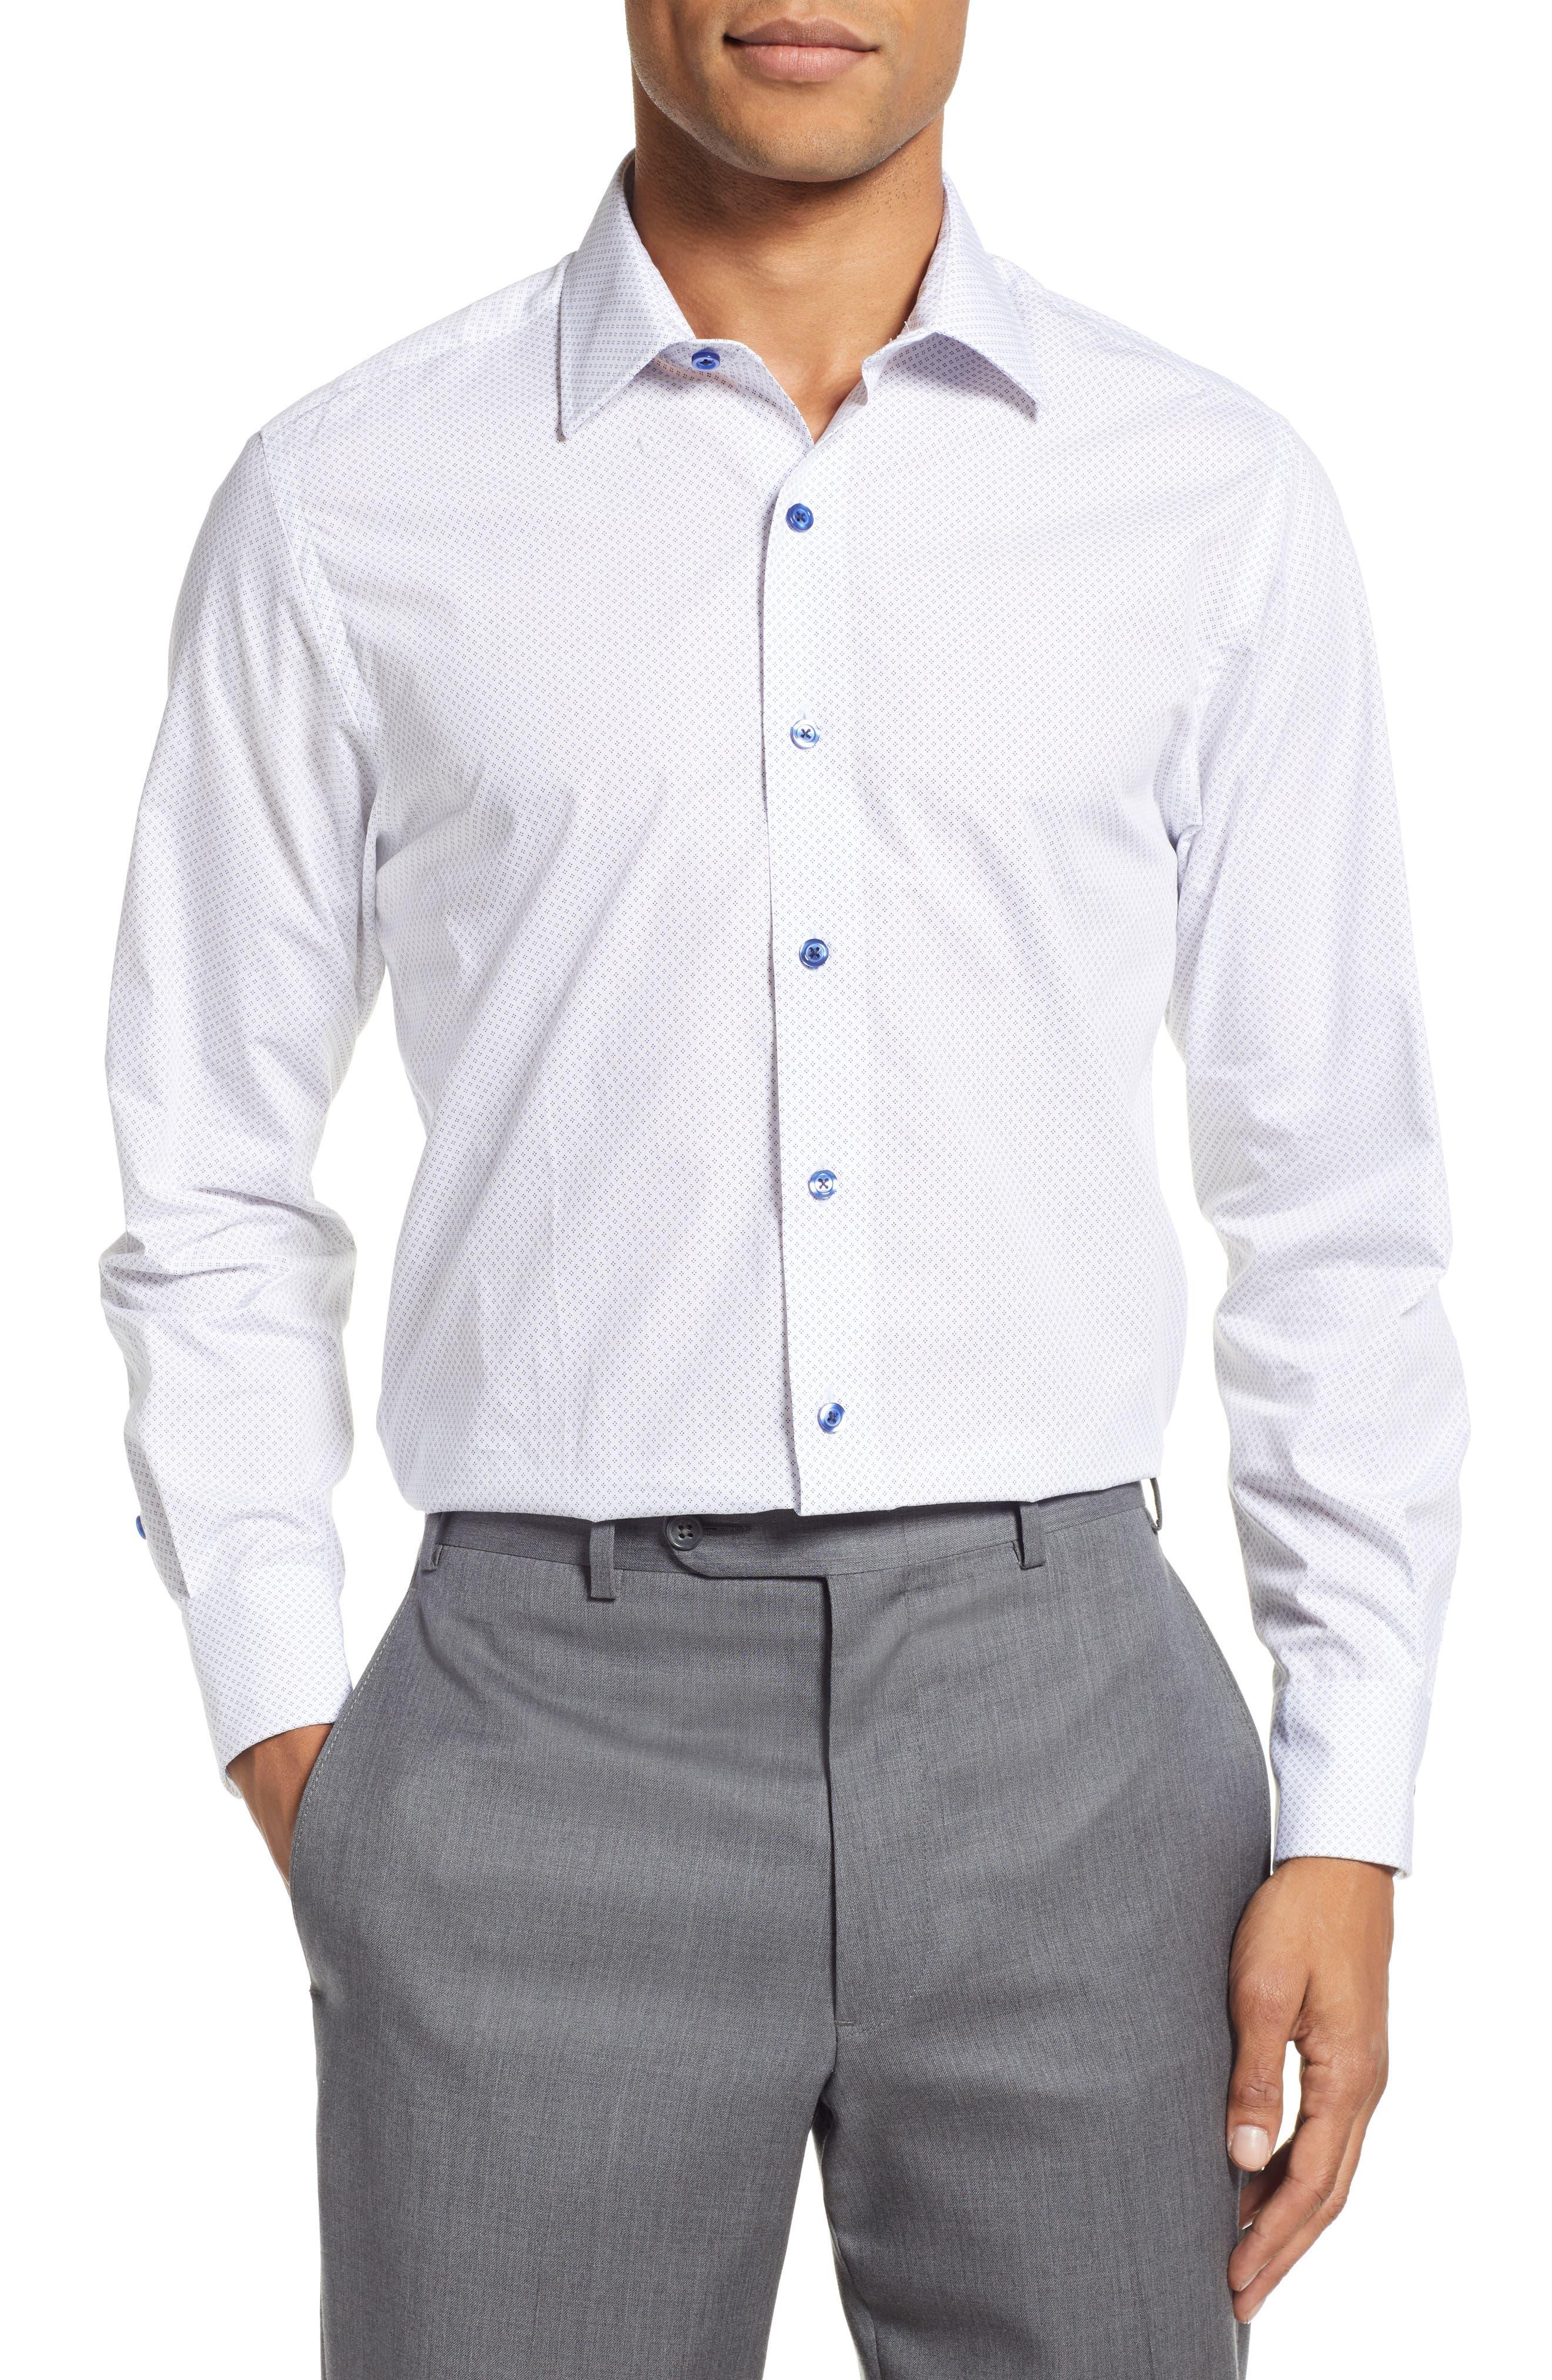 Slim Fit Diamond Dress Shirt, Main, color, WHITE DIAMOND DOT